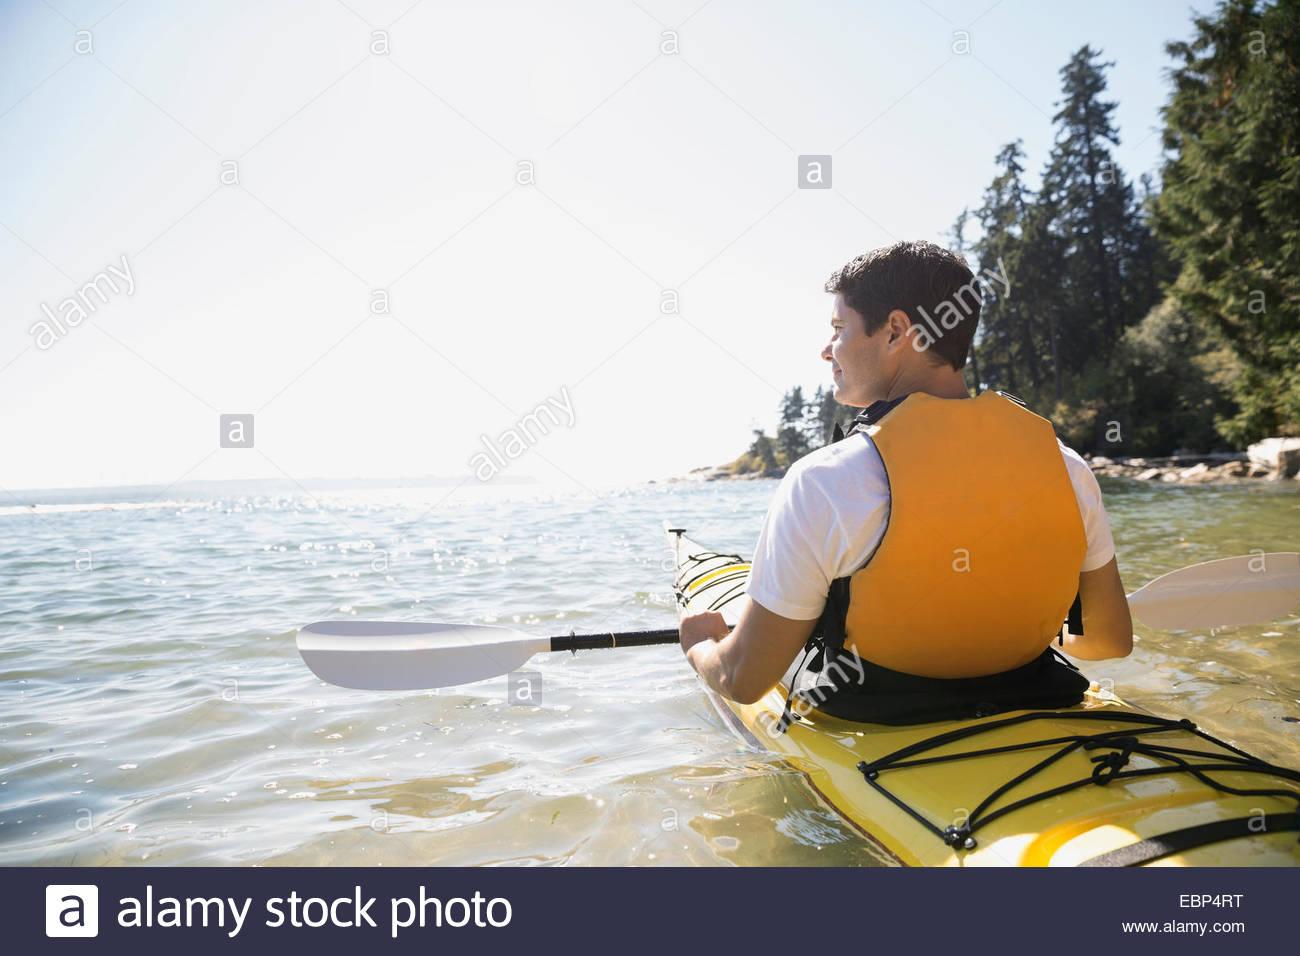 L'uomo kayak sul mare soleggiato Immagini Stock